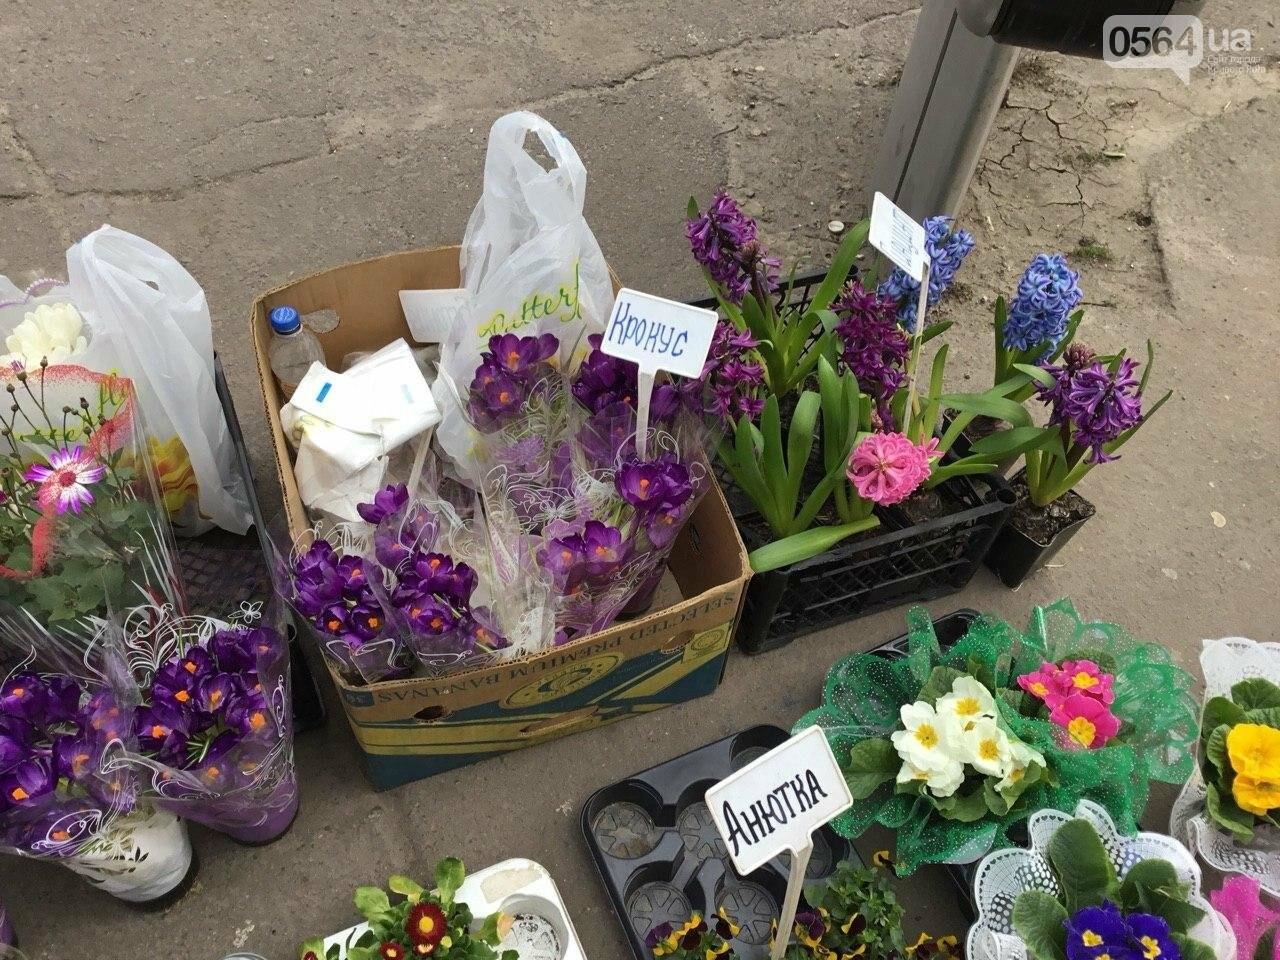 Сколько стоят примула, цикламен, мимоза? Обзор цен на цветы в Кривом Роге, - ФОТО, ВИДЕО, фото-30